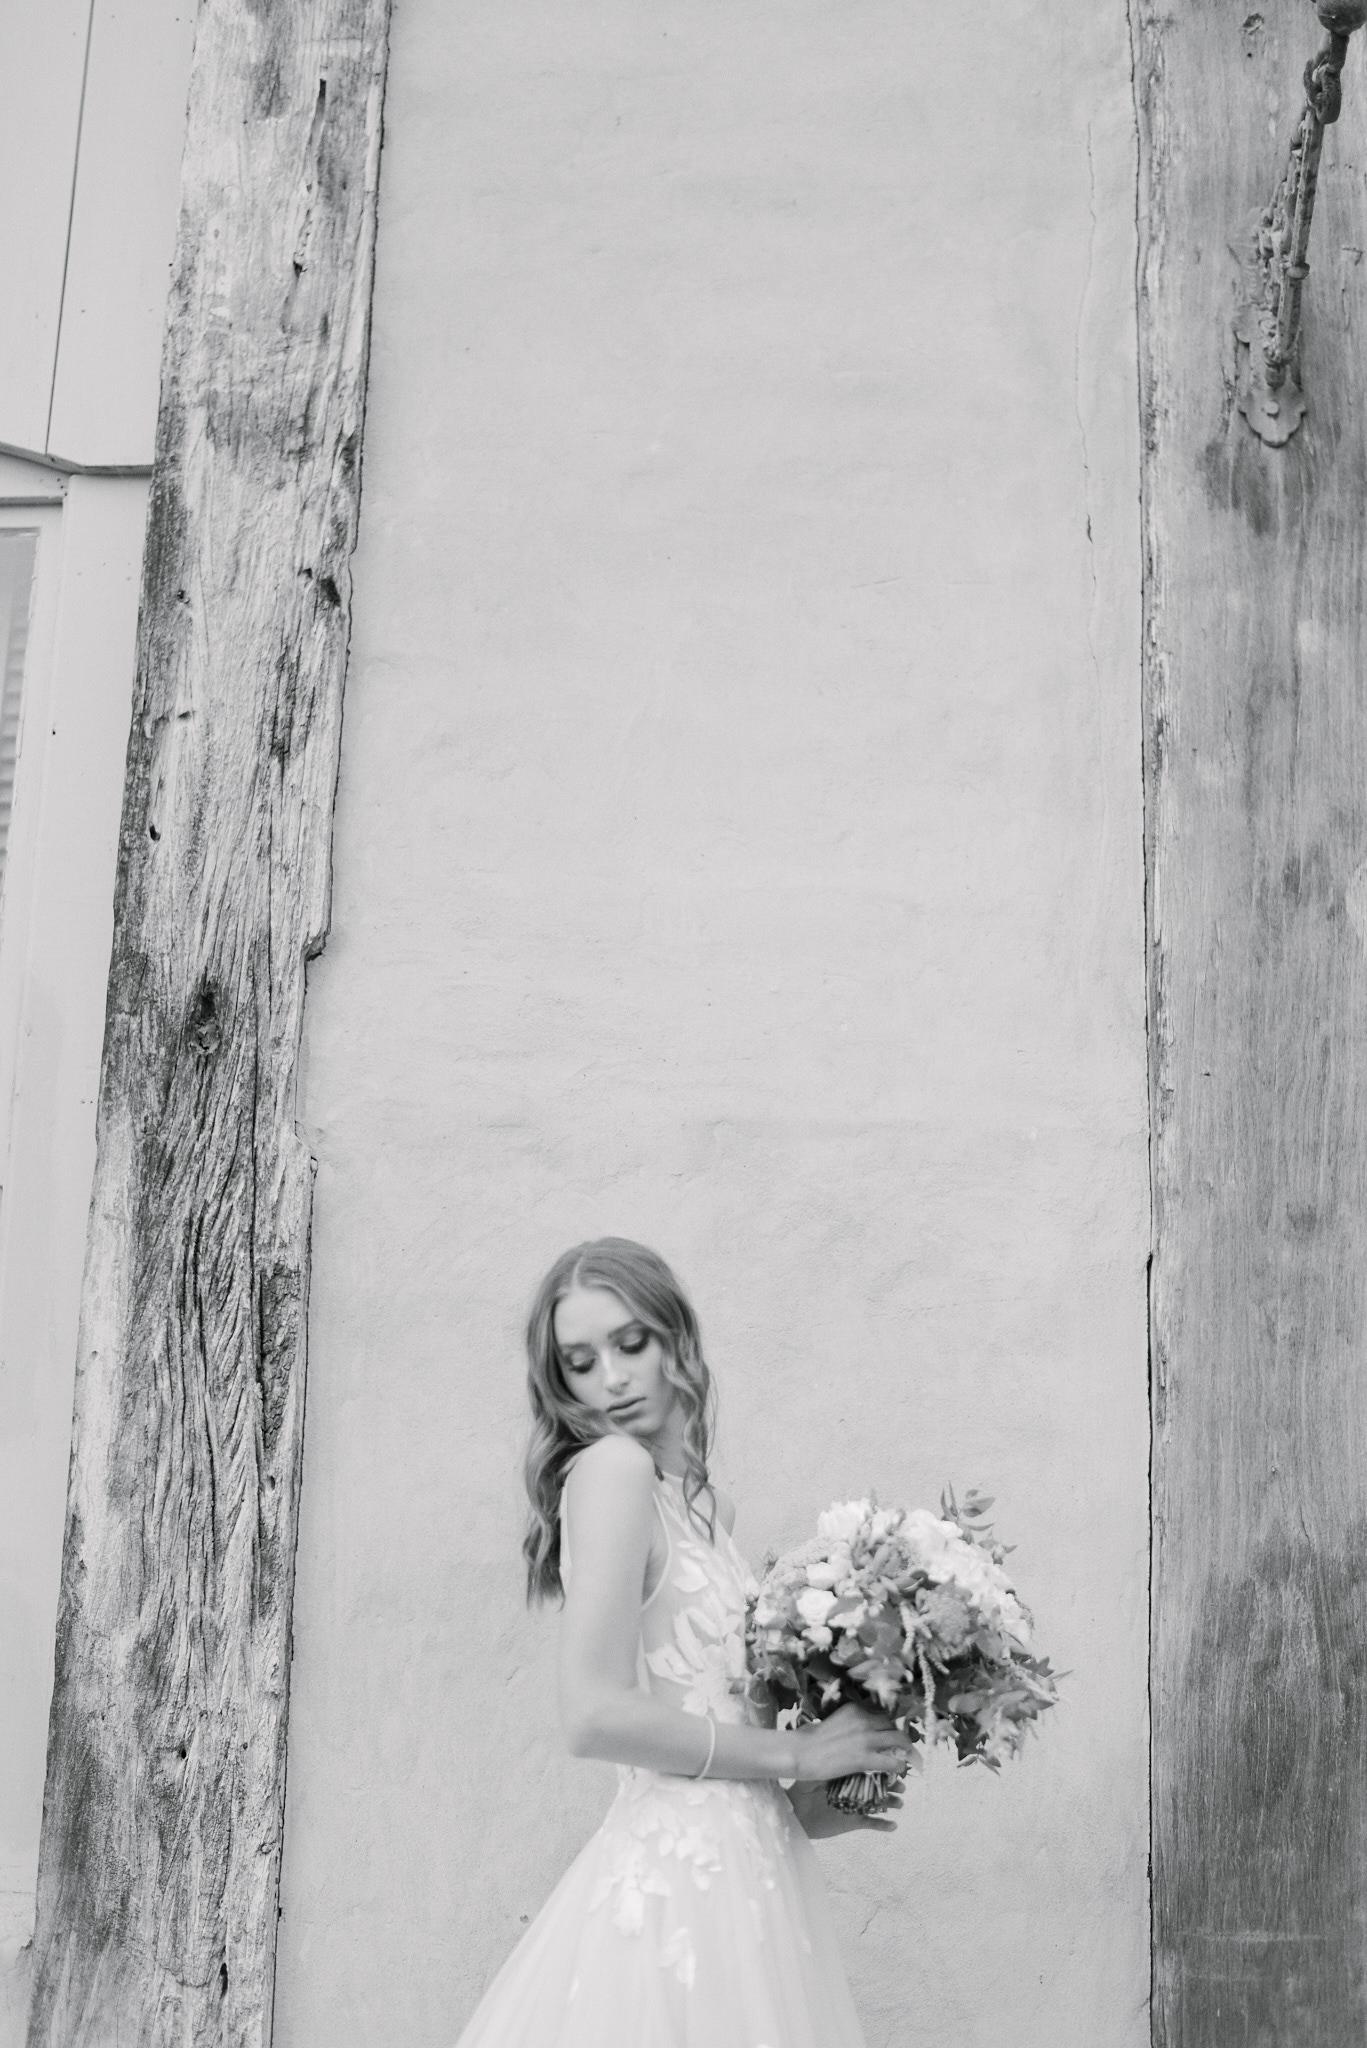 Sephory Photography - Romance is not dead 050 - Web.jpg